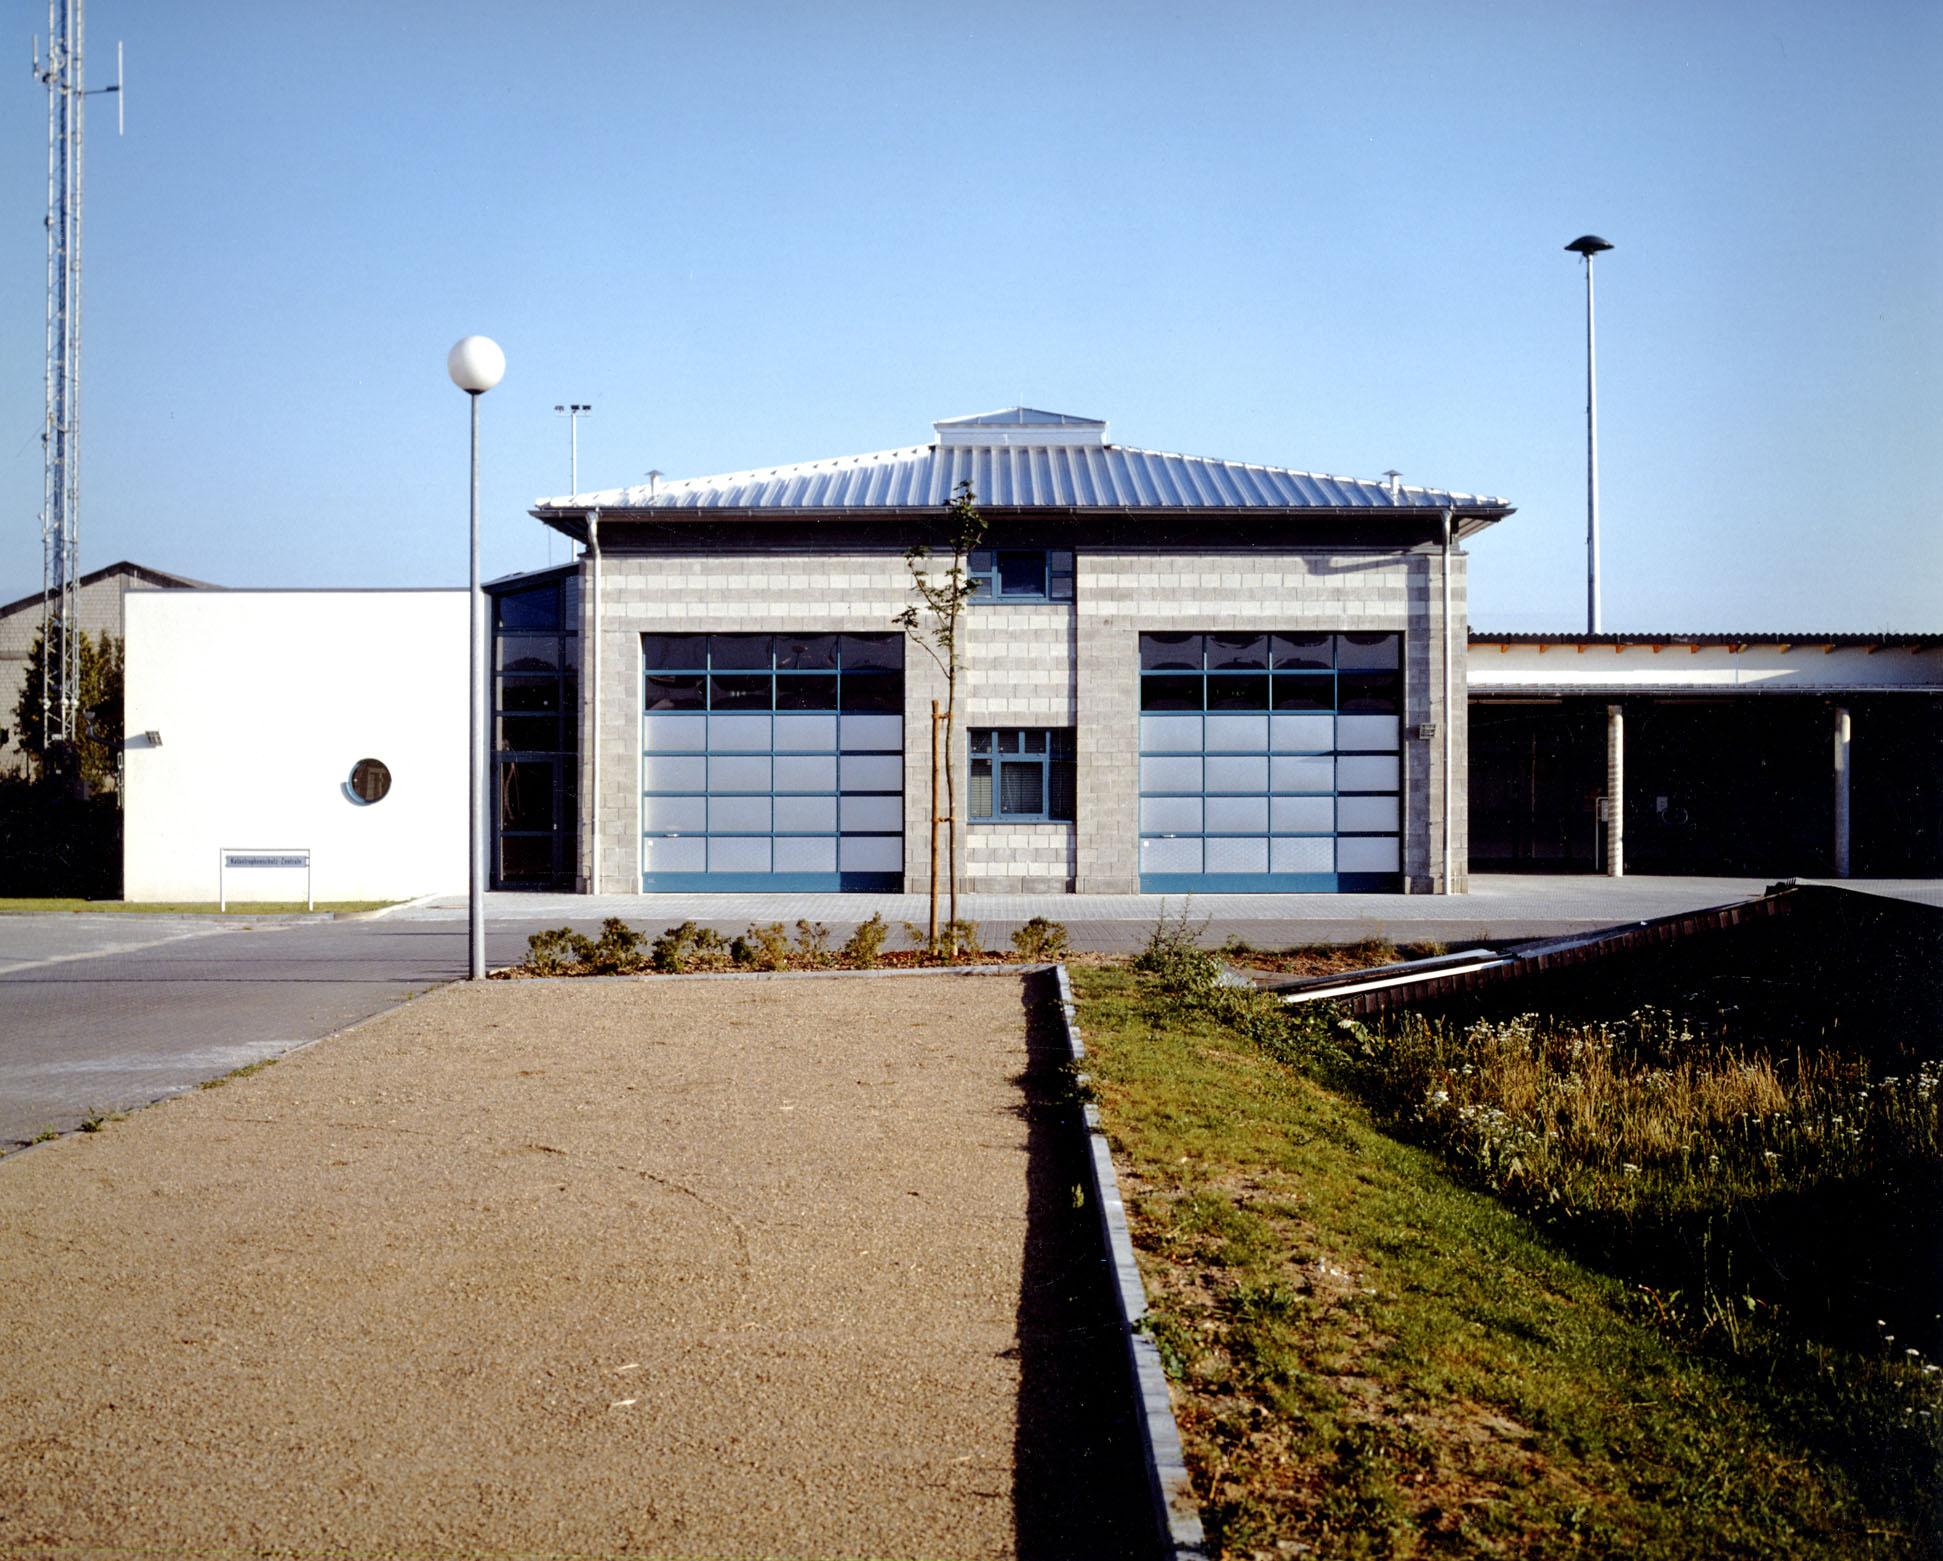 Katastrophenschutz-Zentrale des Kreises Offenbach